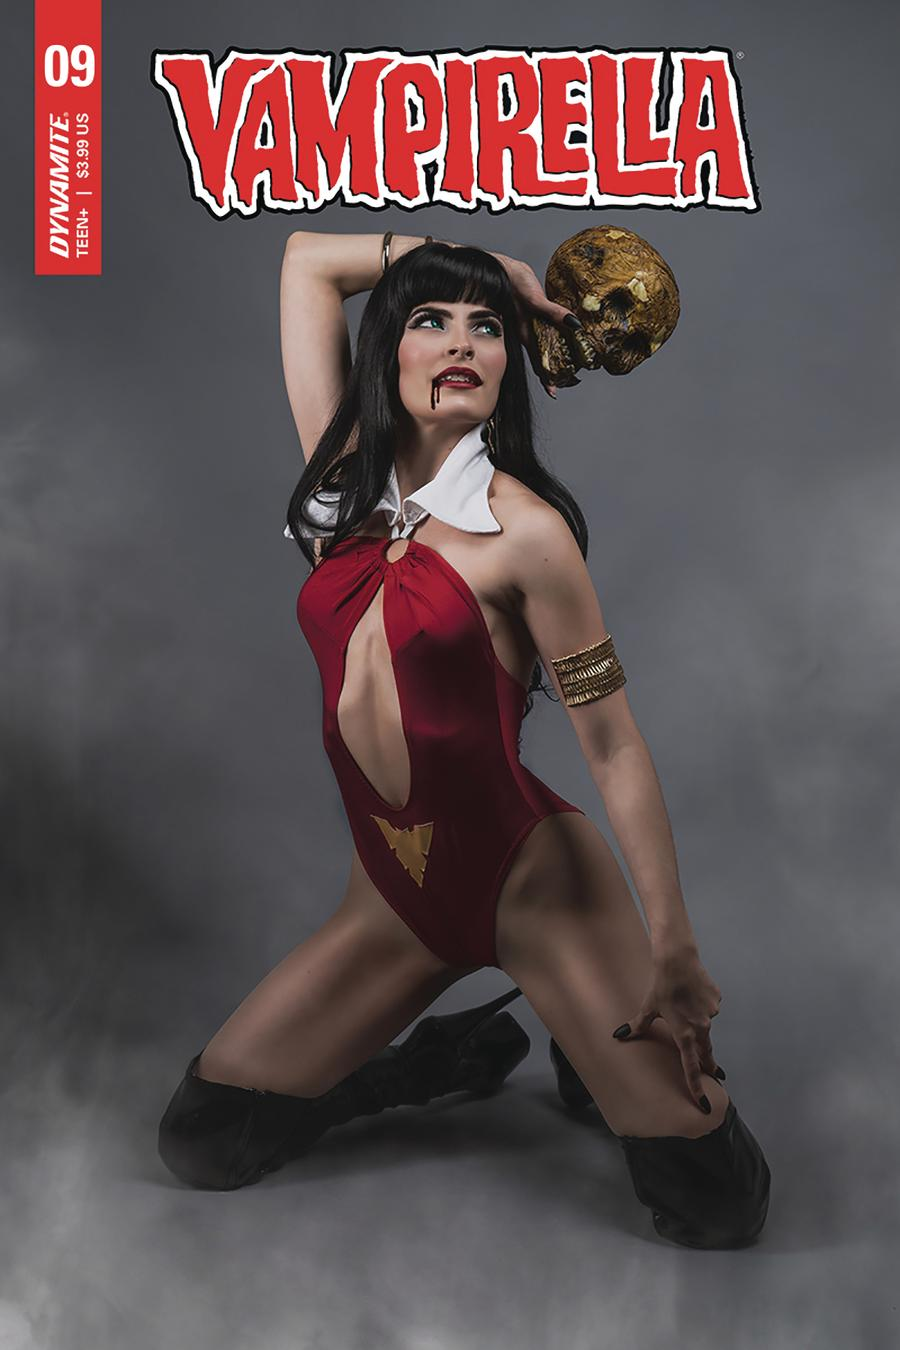 Vampirella Vol 8 #9 Cover E Variant Teena Titan Cosplay Photo Cover